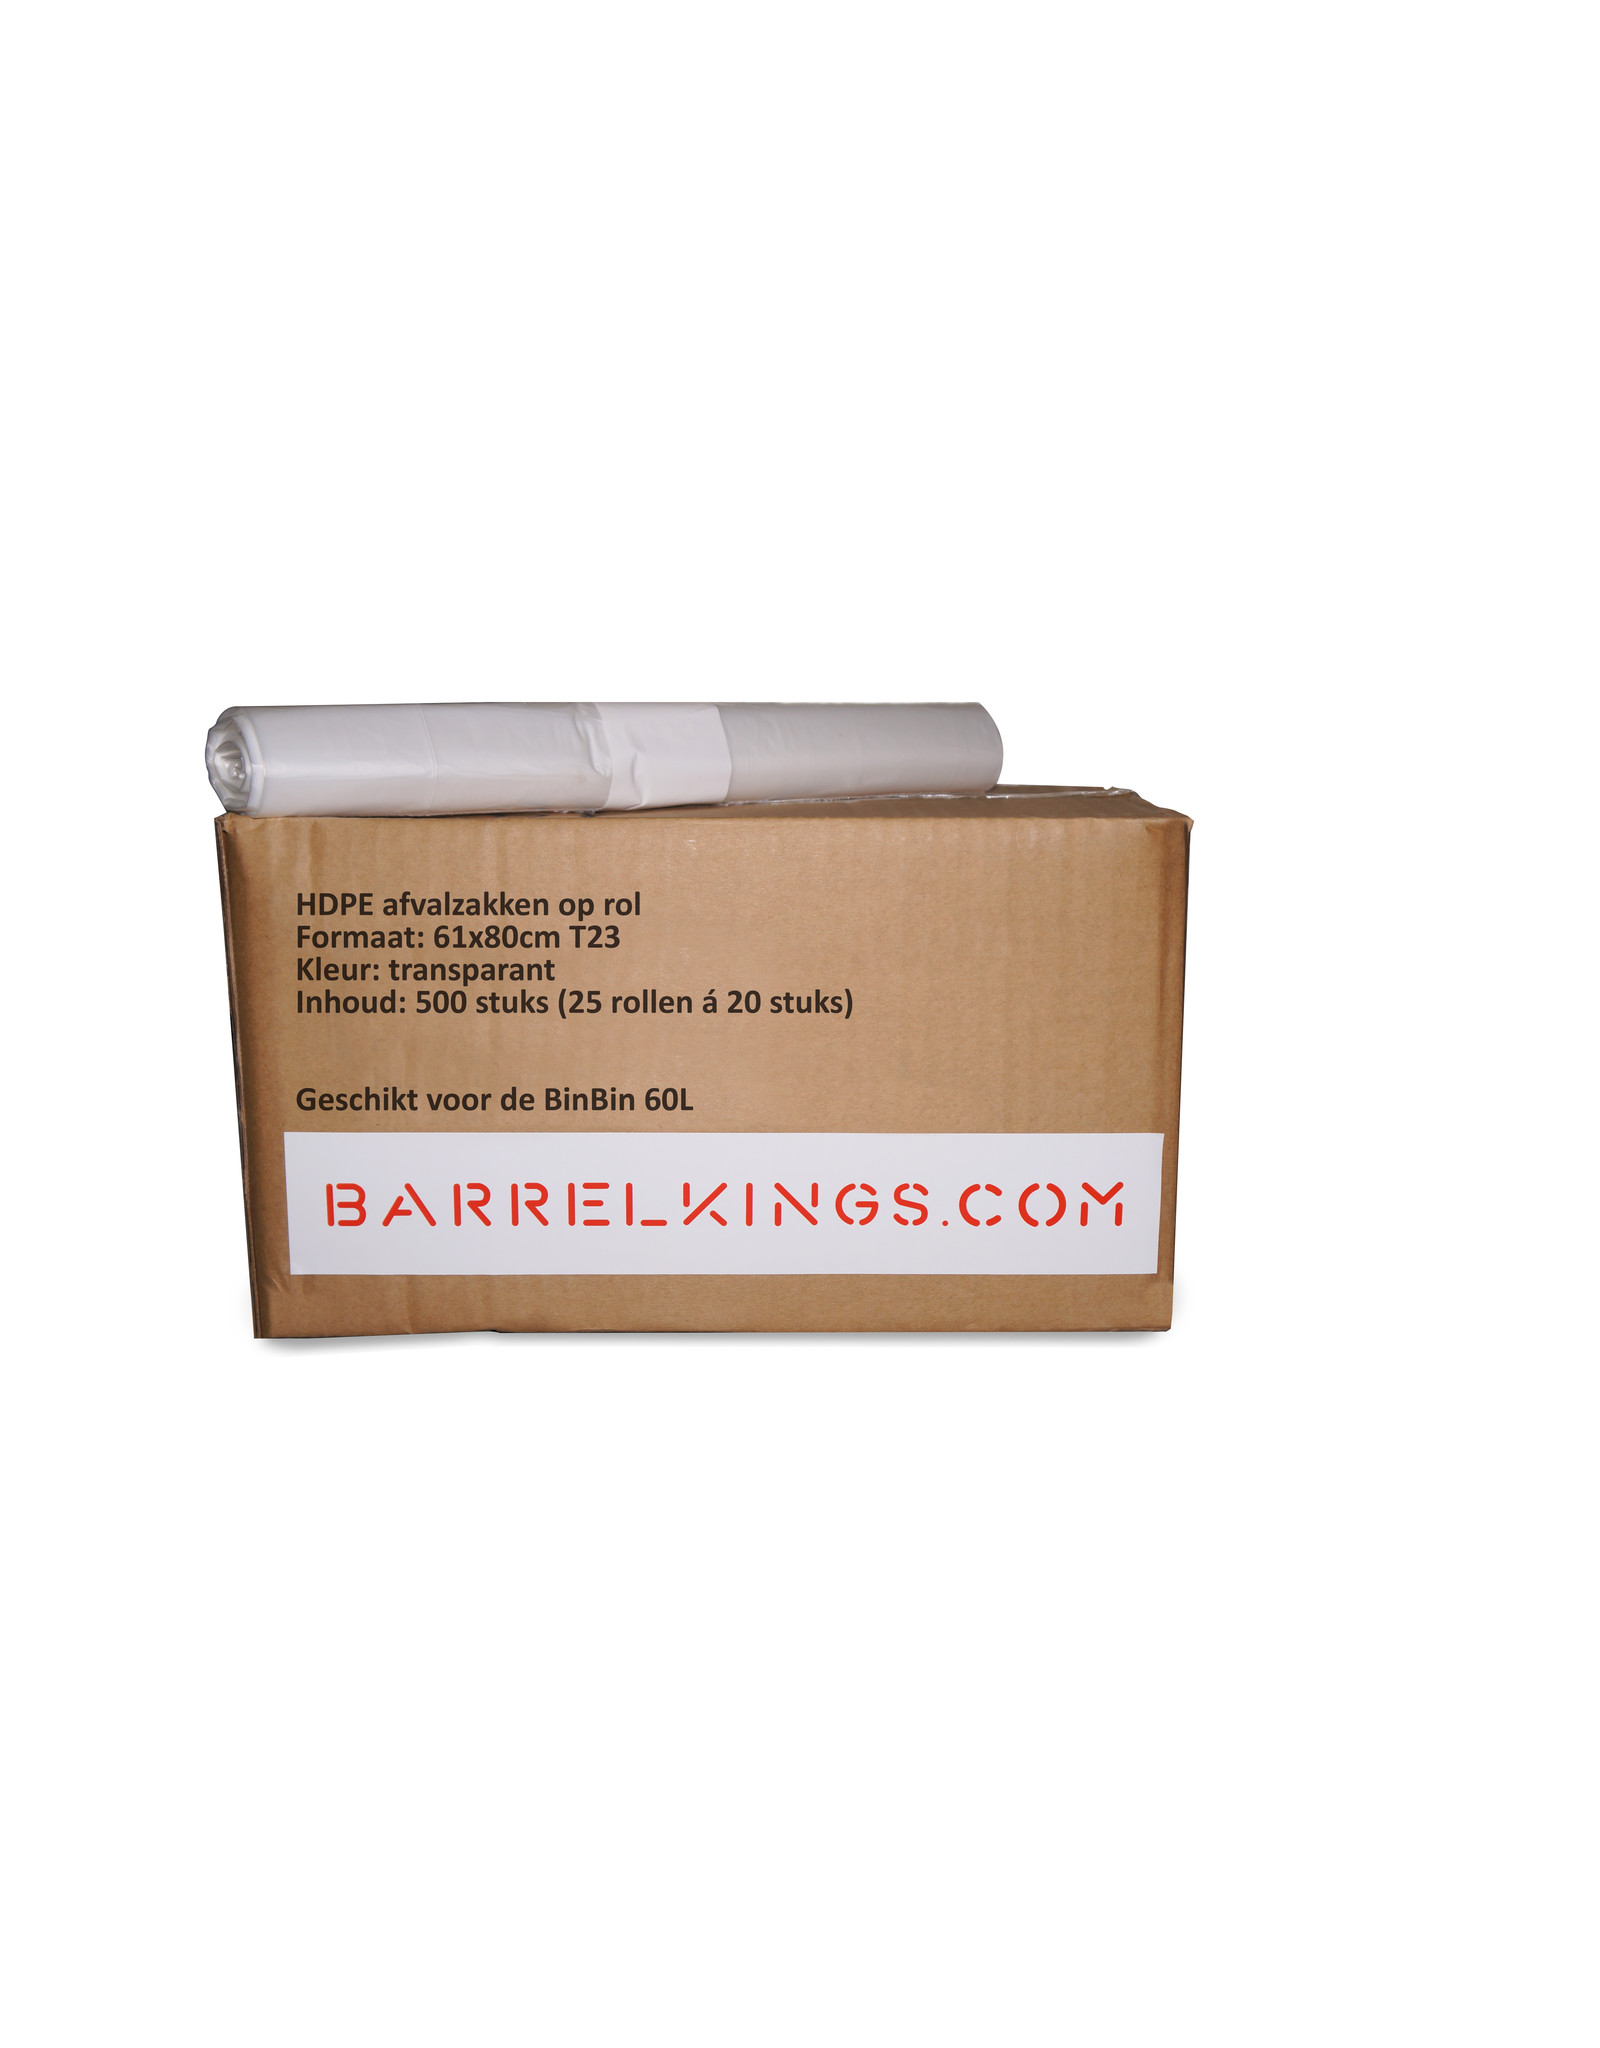 BinBin BinBin Handle Vuil industriële prullenbak afvalscheiding 60 Liter olievat met handvat deksel